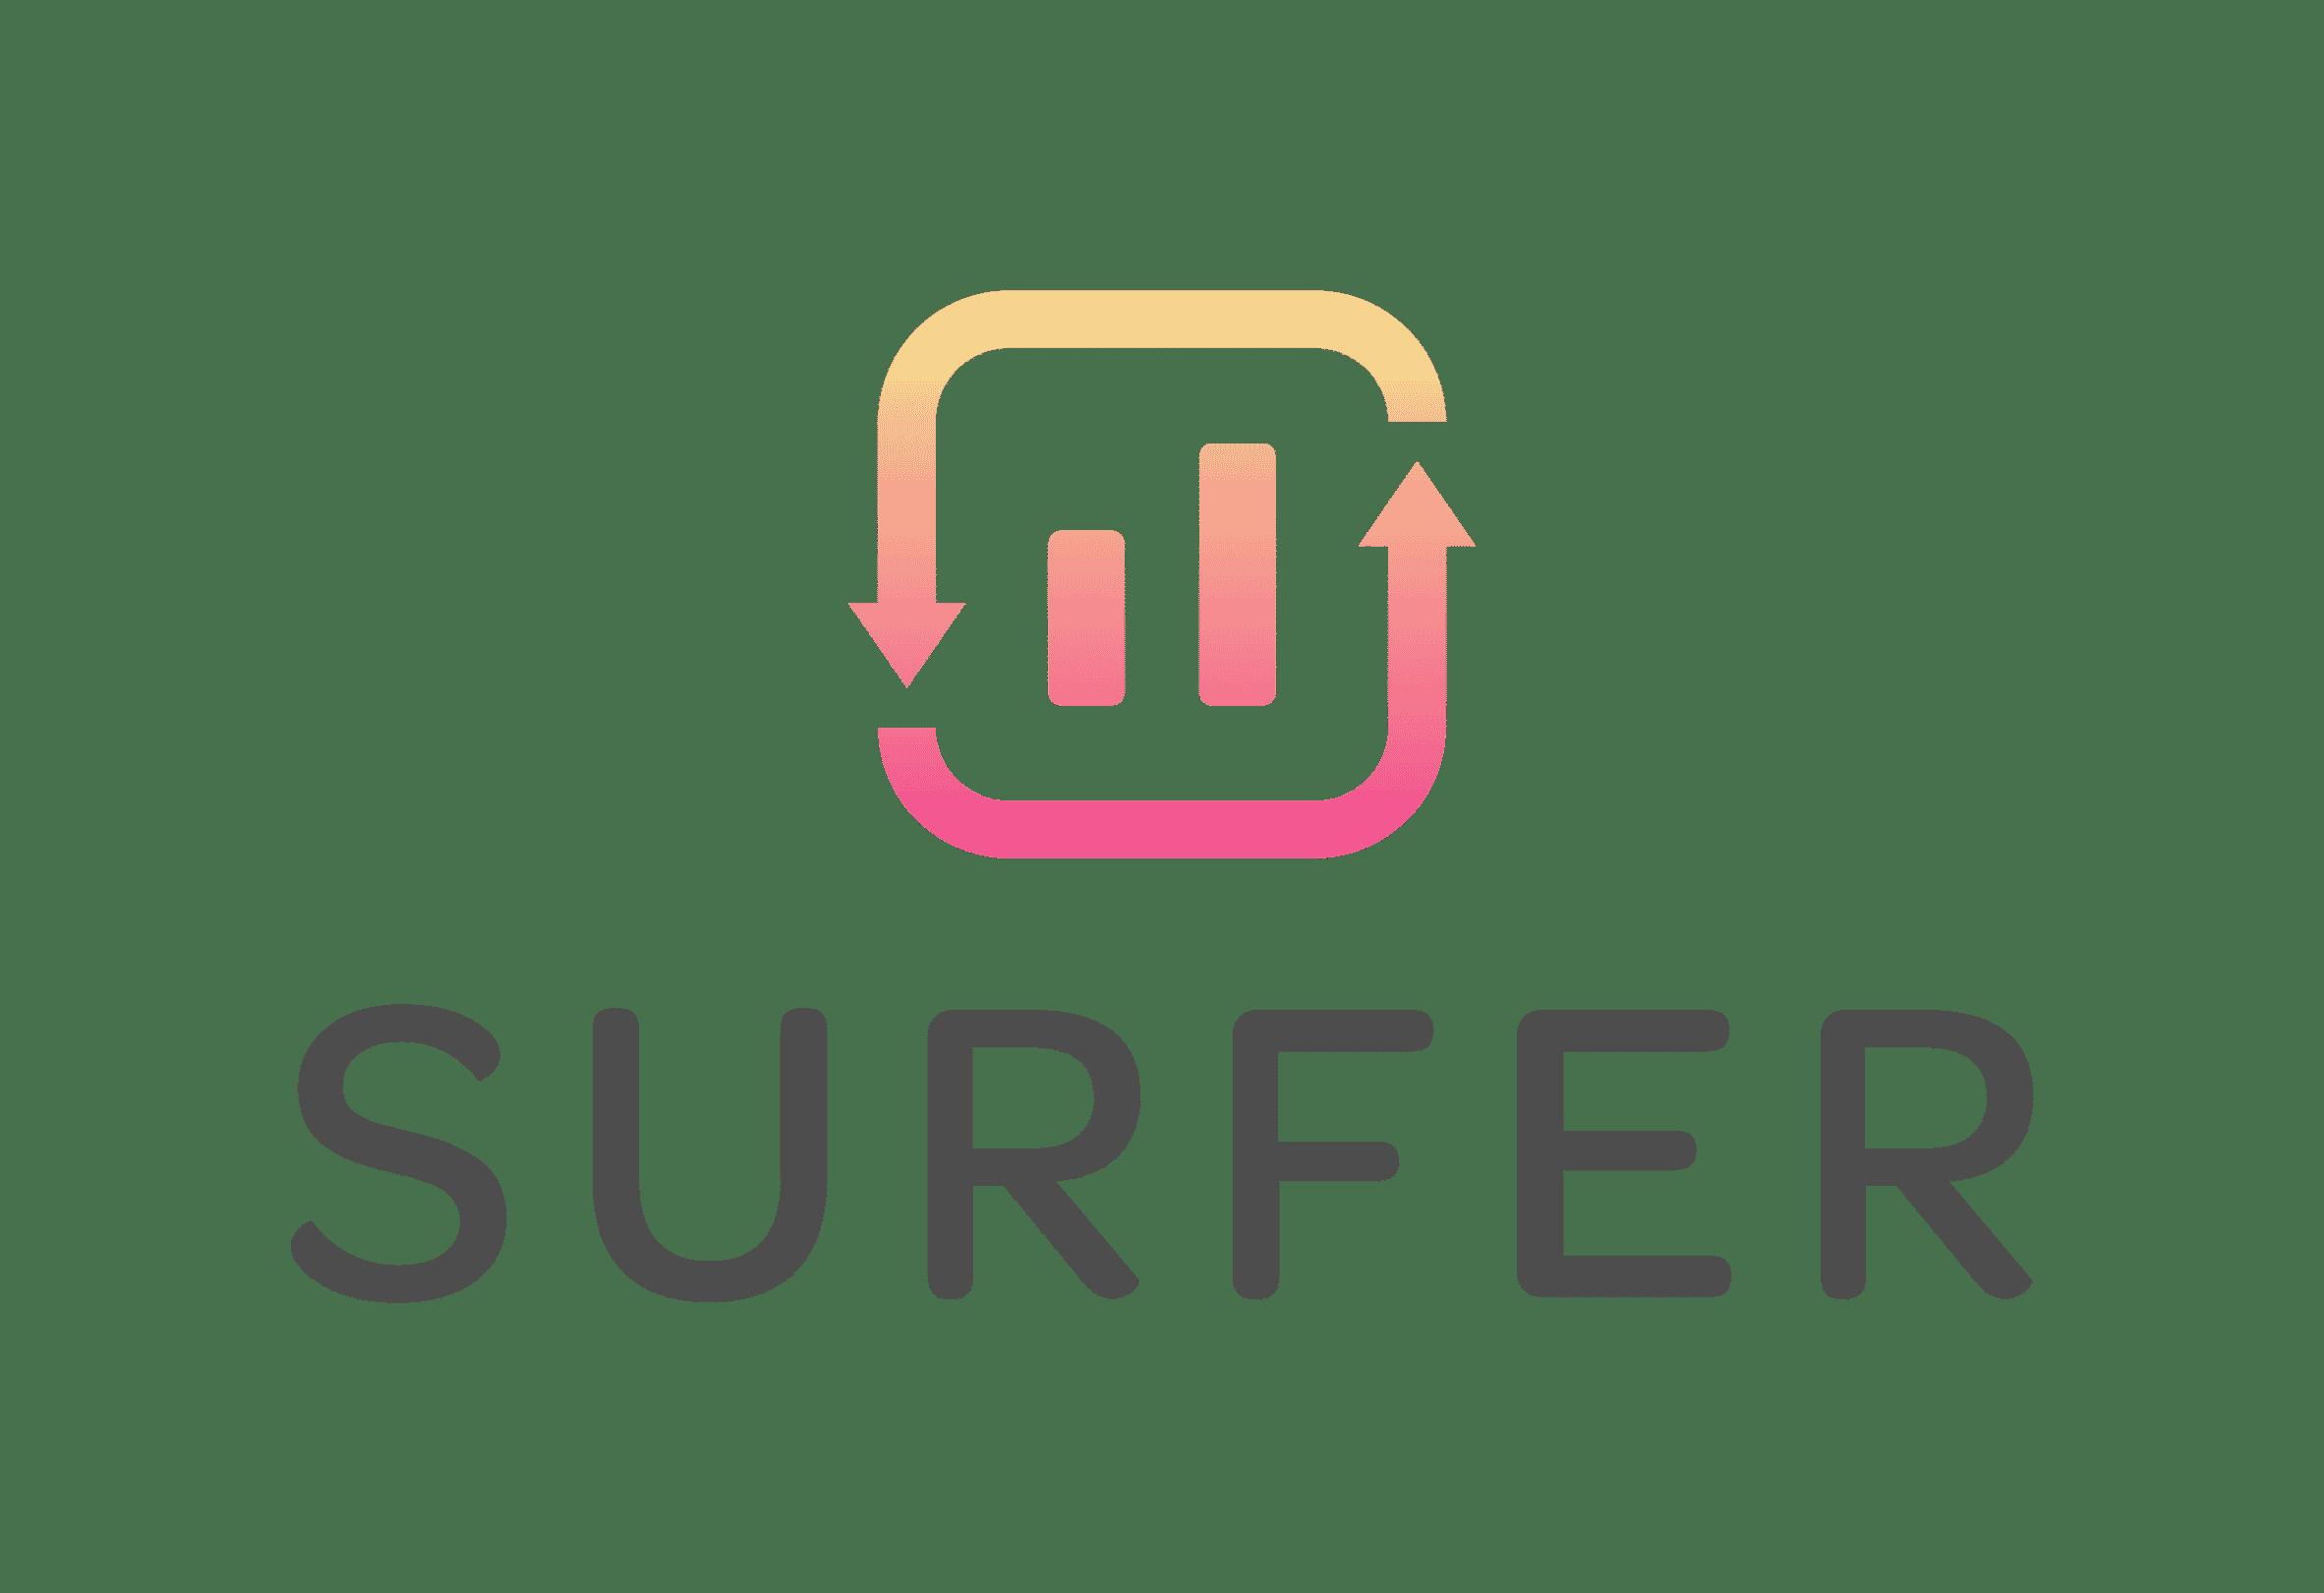 SEOSurfer